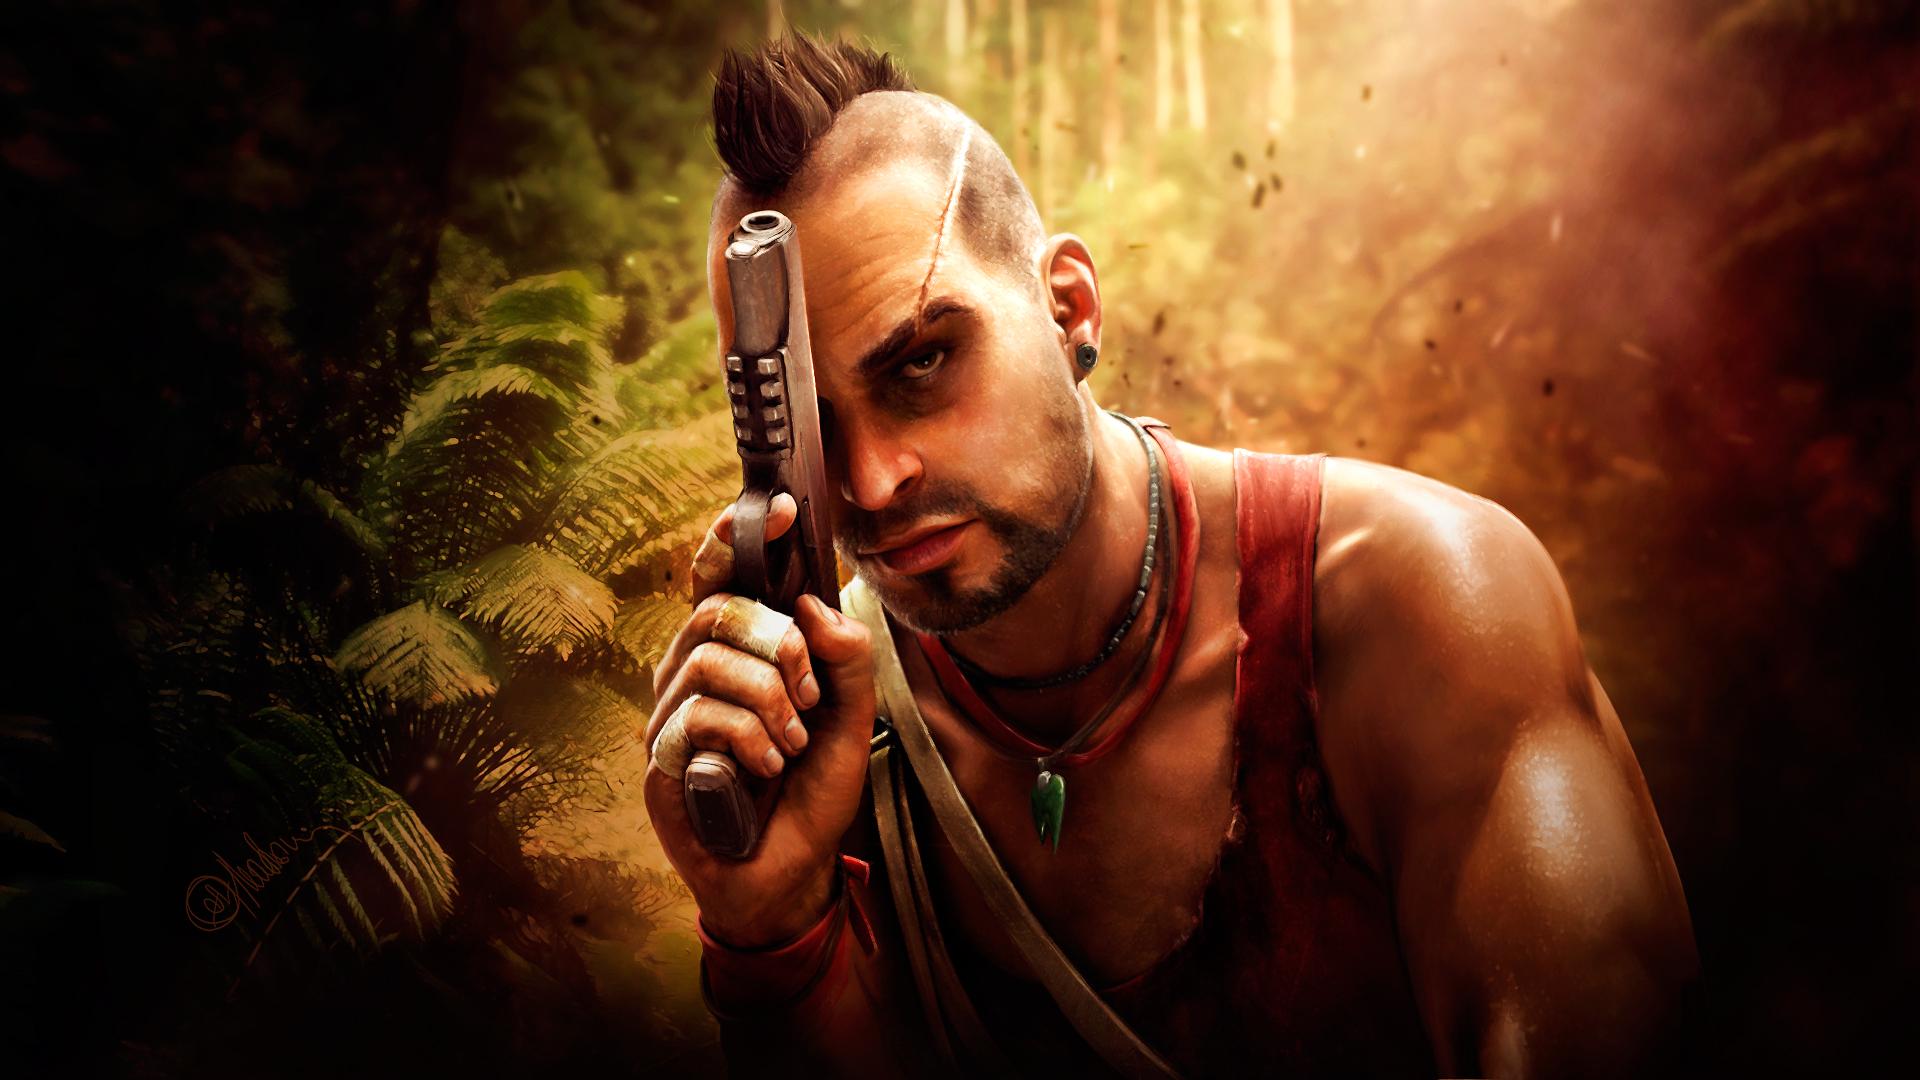 Far cry 3. Vaas Montenegro. Hunter by push-pulse on DeviantArt